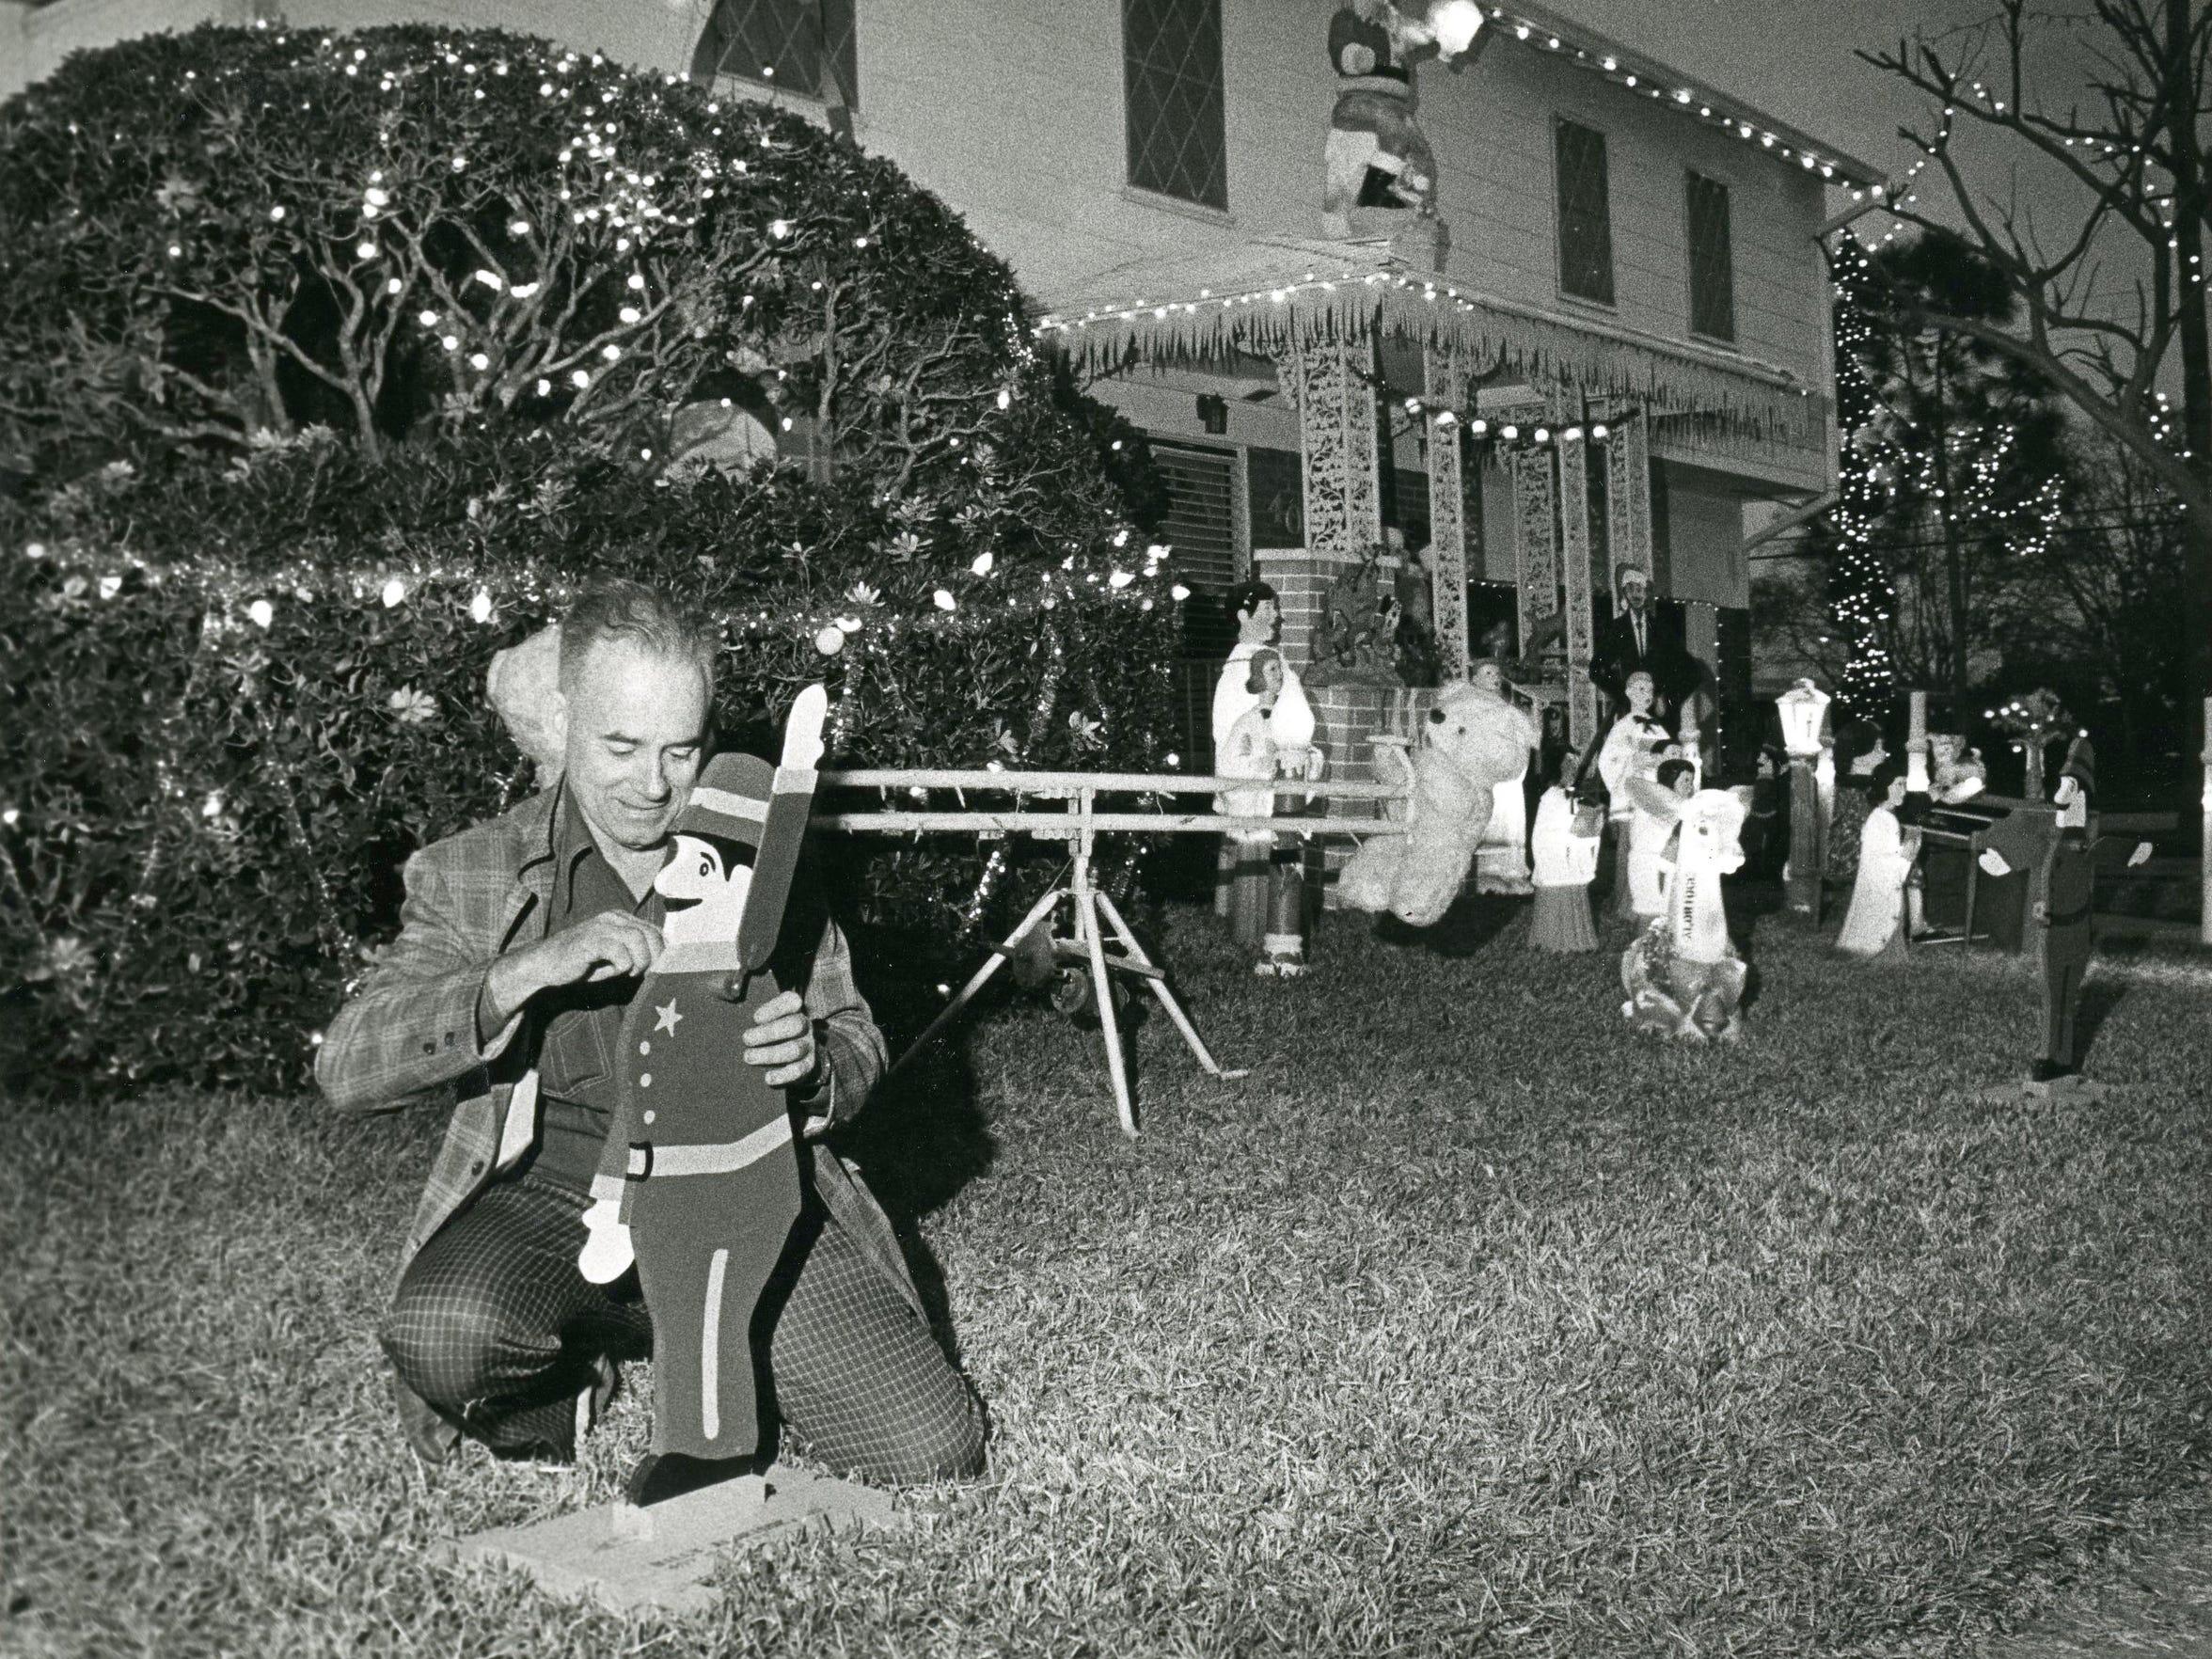 Billy Aldridge adjusts one of the multitude of Christmas